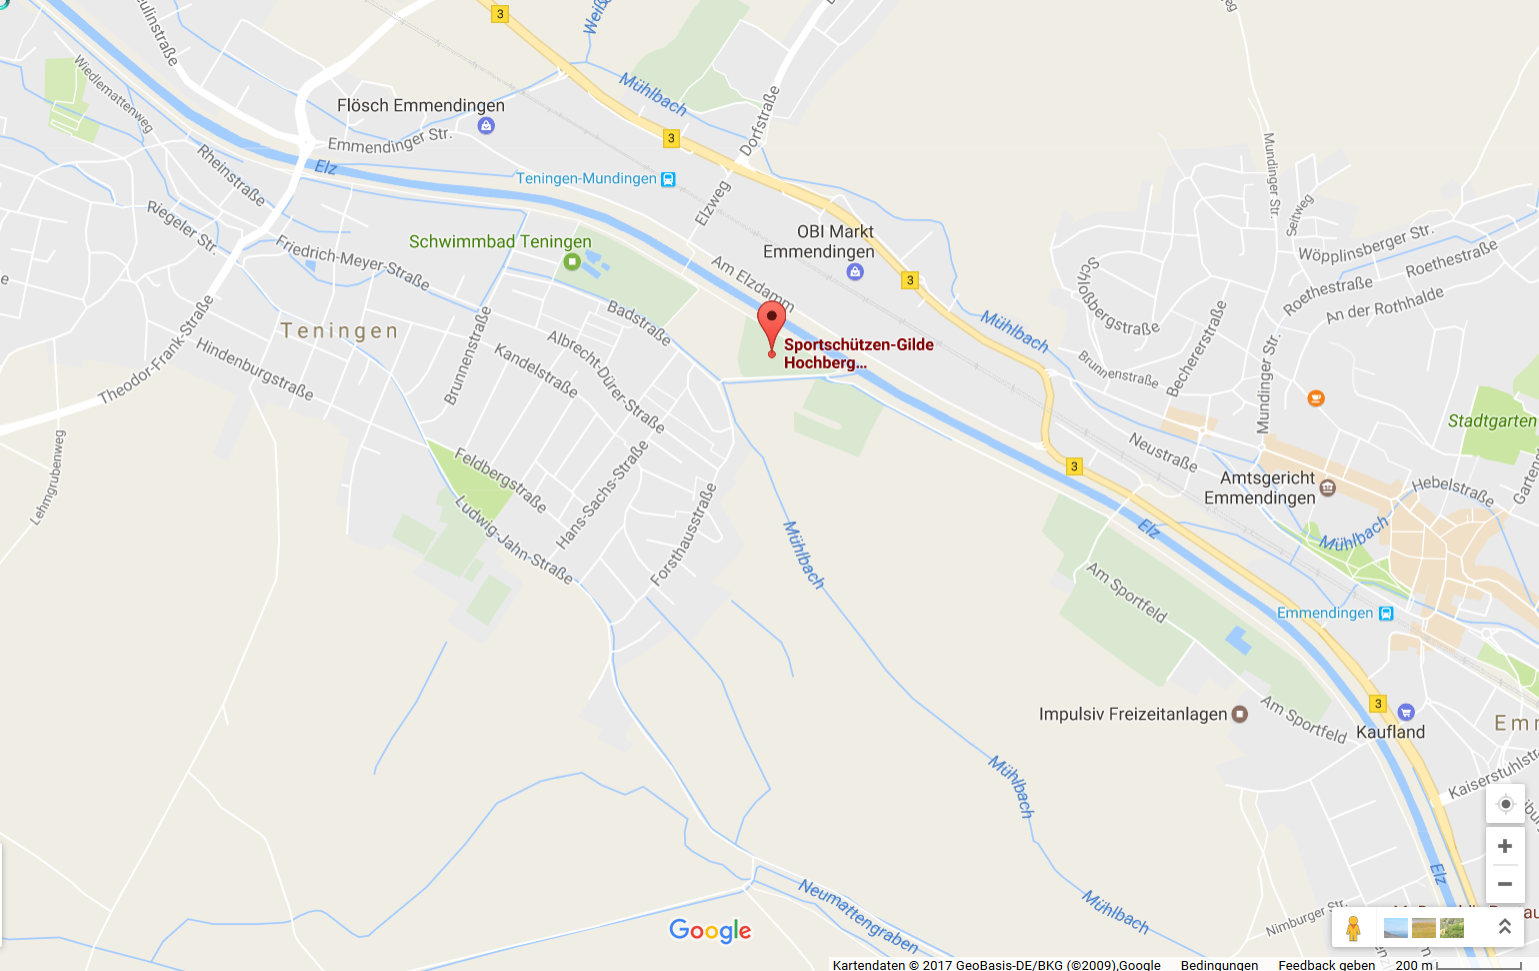 2017_01_10_14_51_40_sportschutzen_gilde_hochberg_emmendingen_ev_google_maps